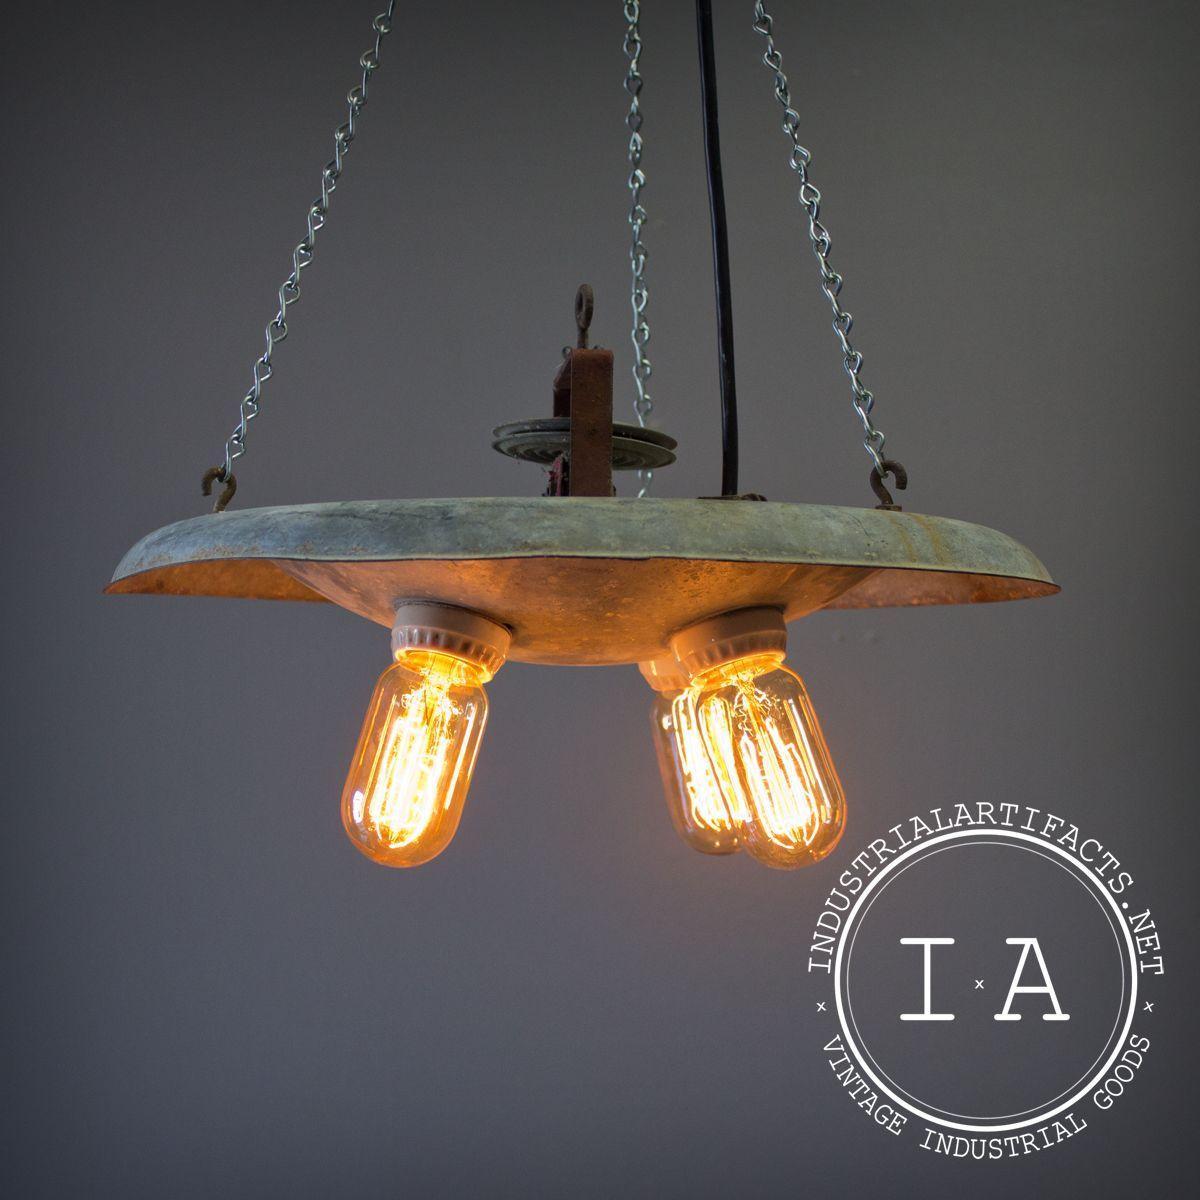 Vintage Industrial 4 Bulb Brooder Lamp Chandelier Bulb Edison Bulb Lamp Repurposed Lamp